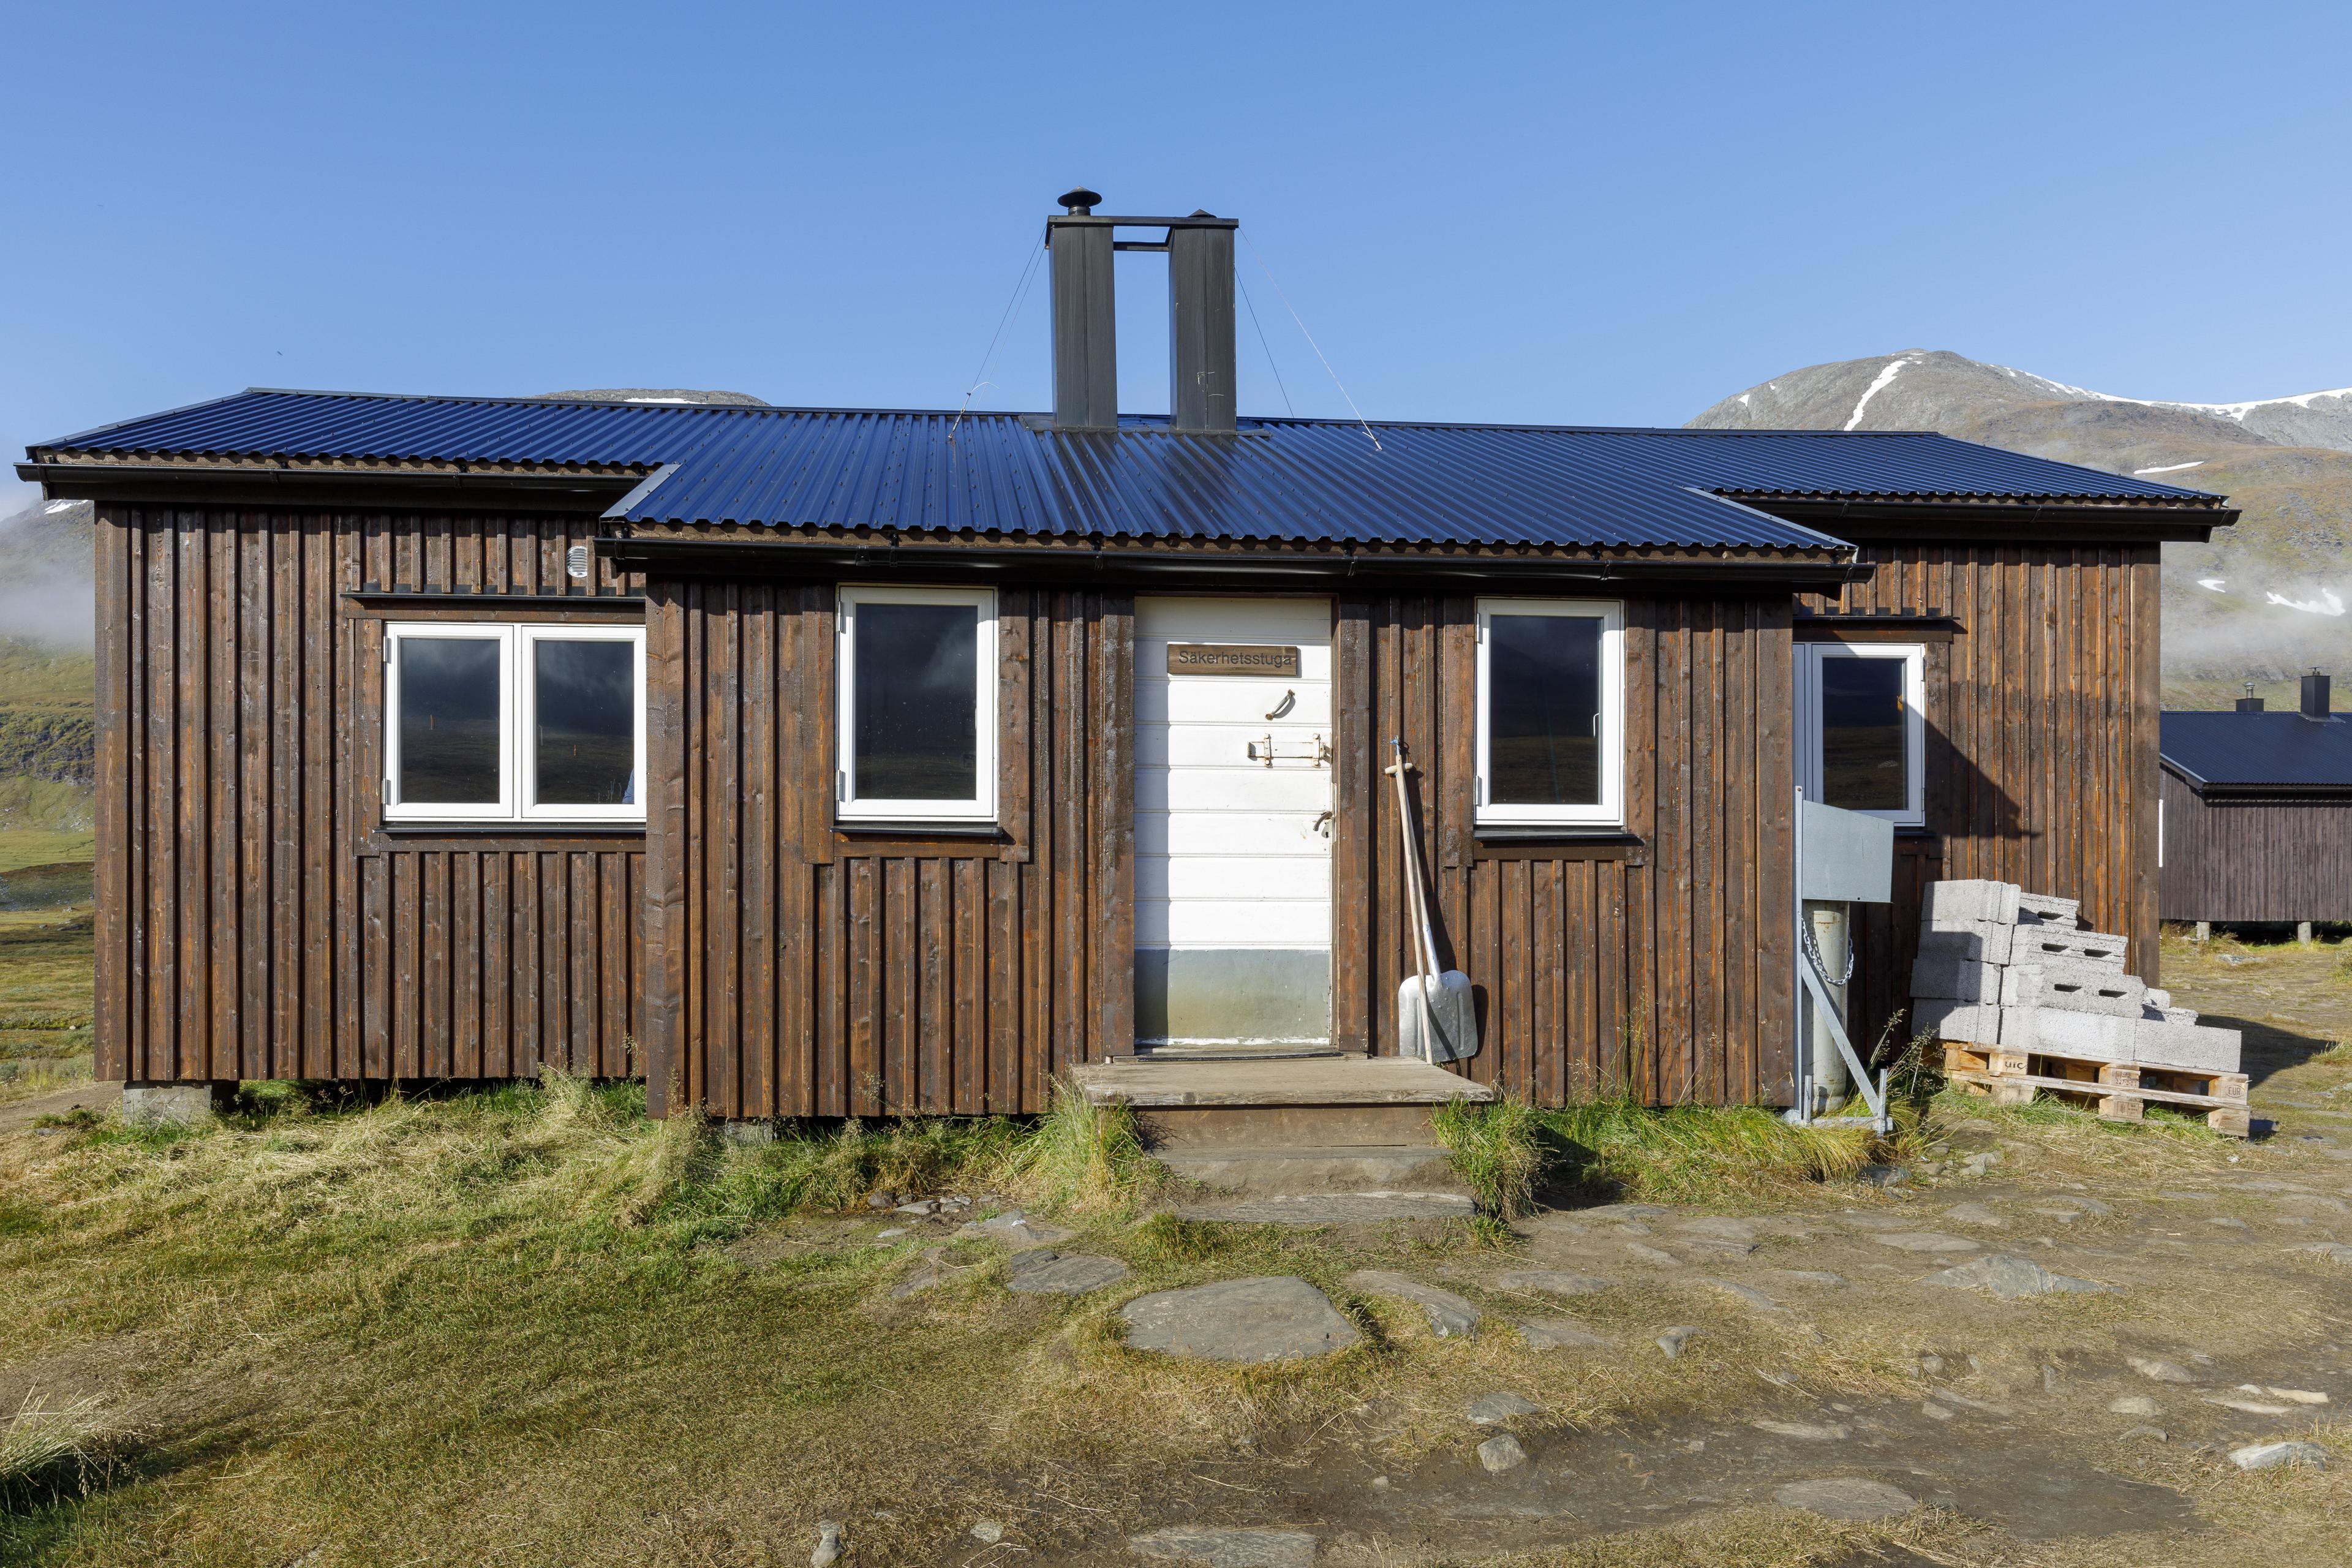 Unsere Hütte, die Säkerhetsstuga,©Markus Proske—Canon EOS 5D Mark IV, EF16-35mm f/4L IS USM, 25mm, 1/200s, Blende 11, ISO 200